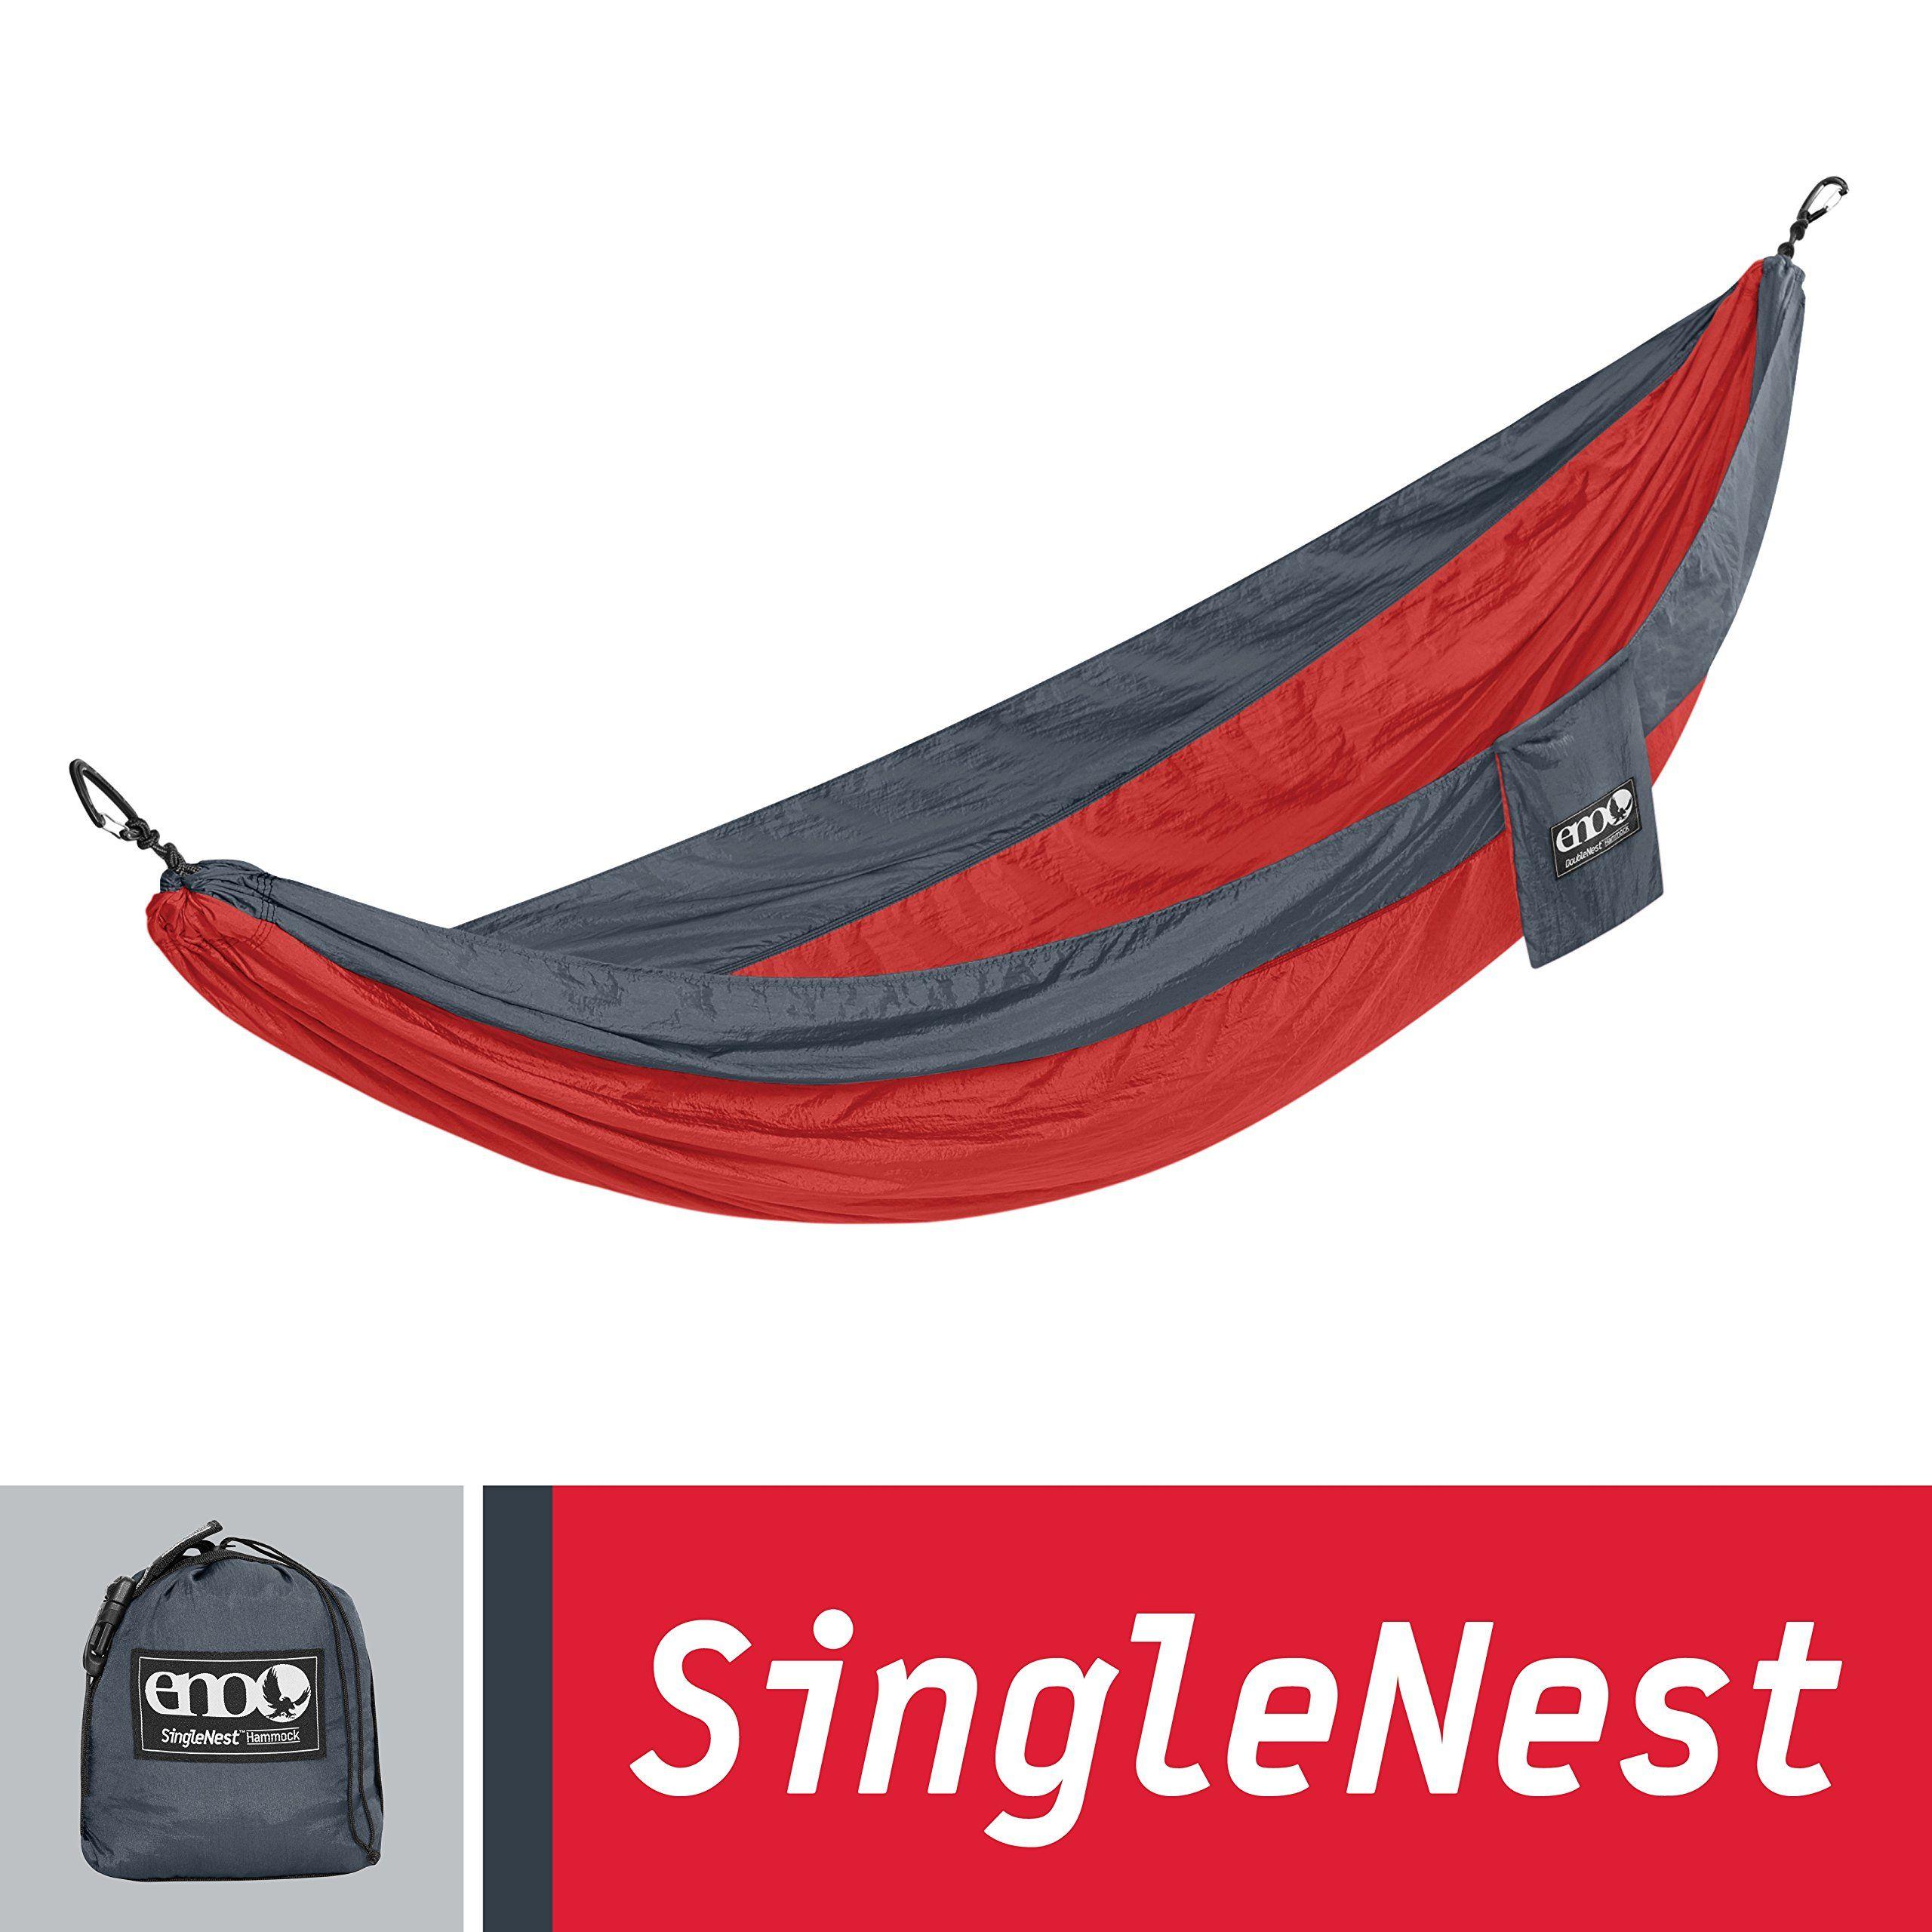 ebay hammock eno singlenest uk com doublenest etsustore